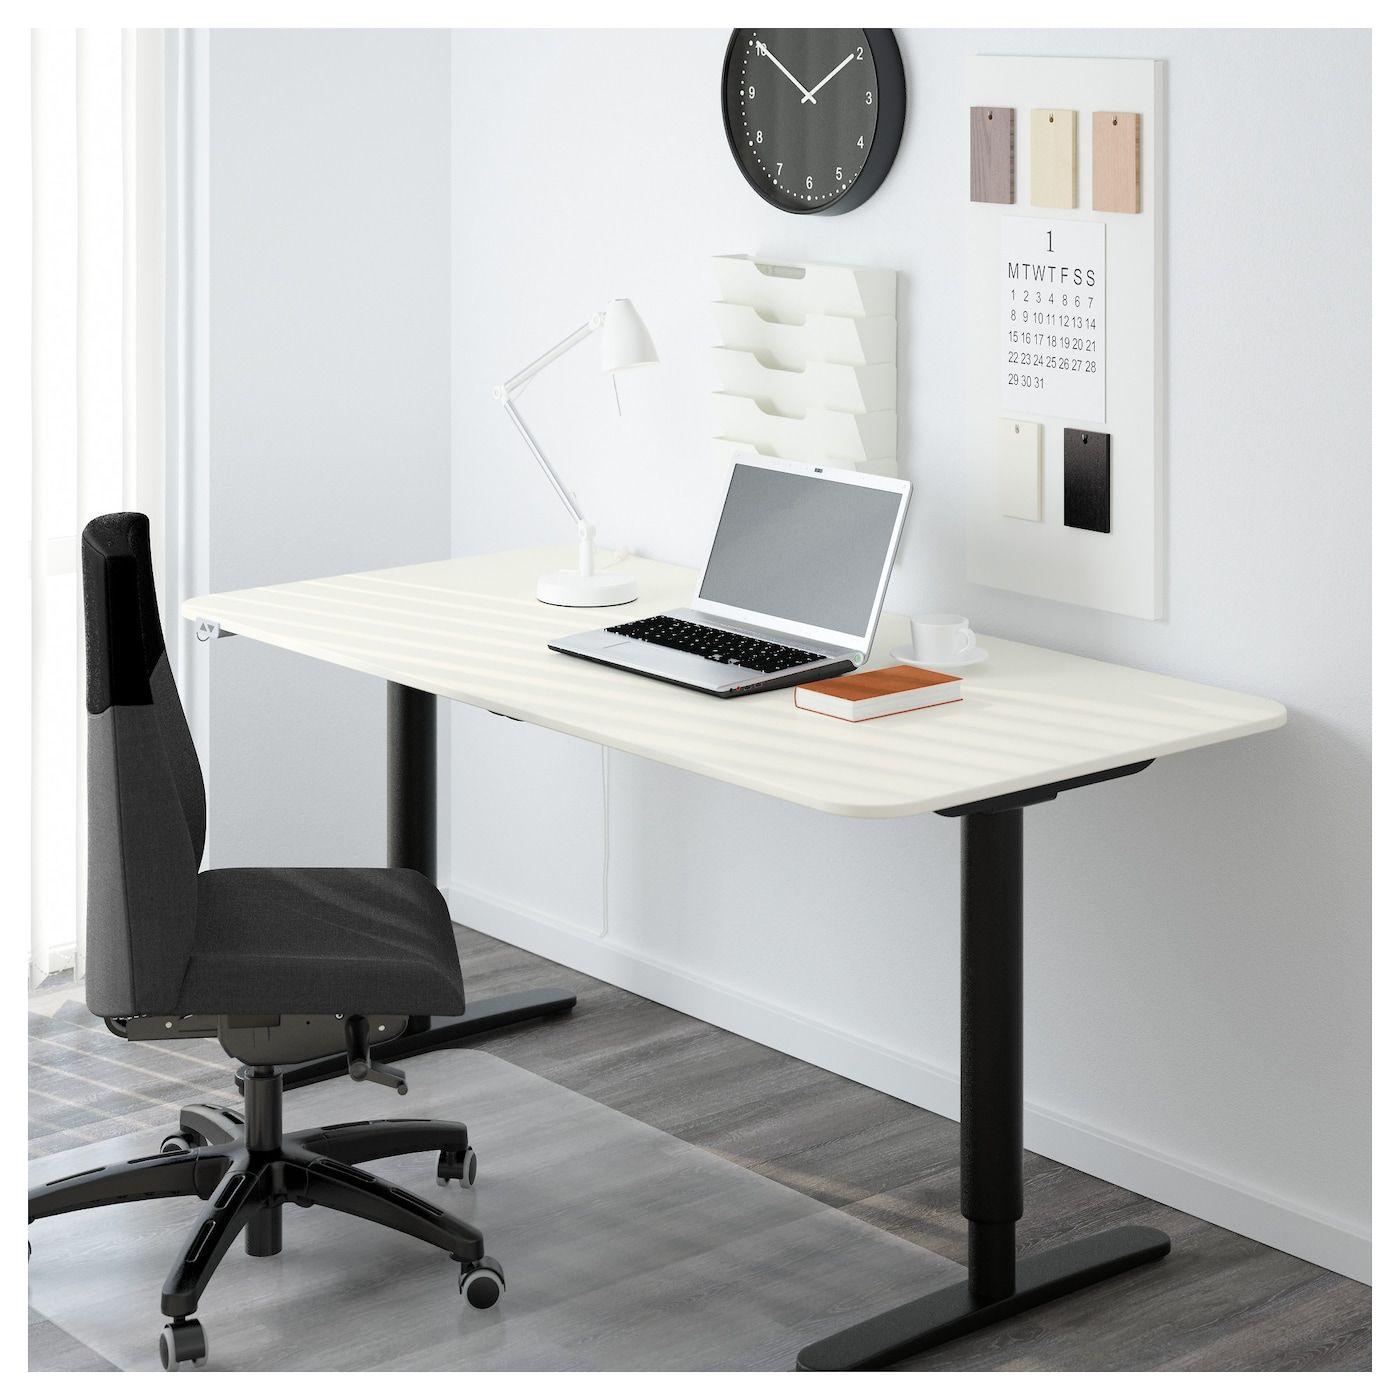 Bekant Table Top White 160x80 Cm In 2020 Ikea Bekant Corner Table Ikea Office Furniture